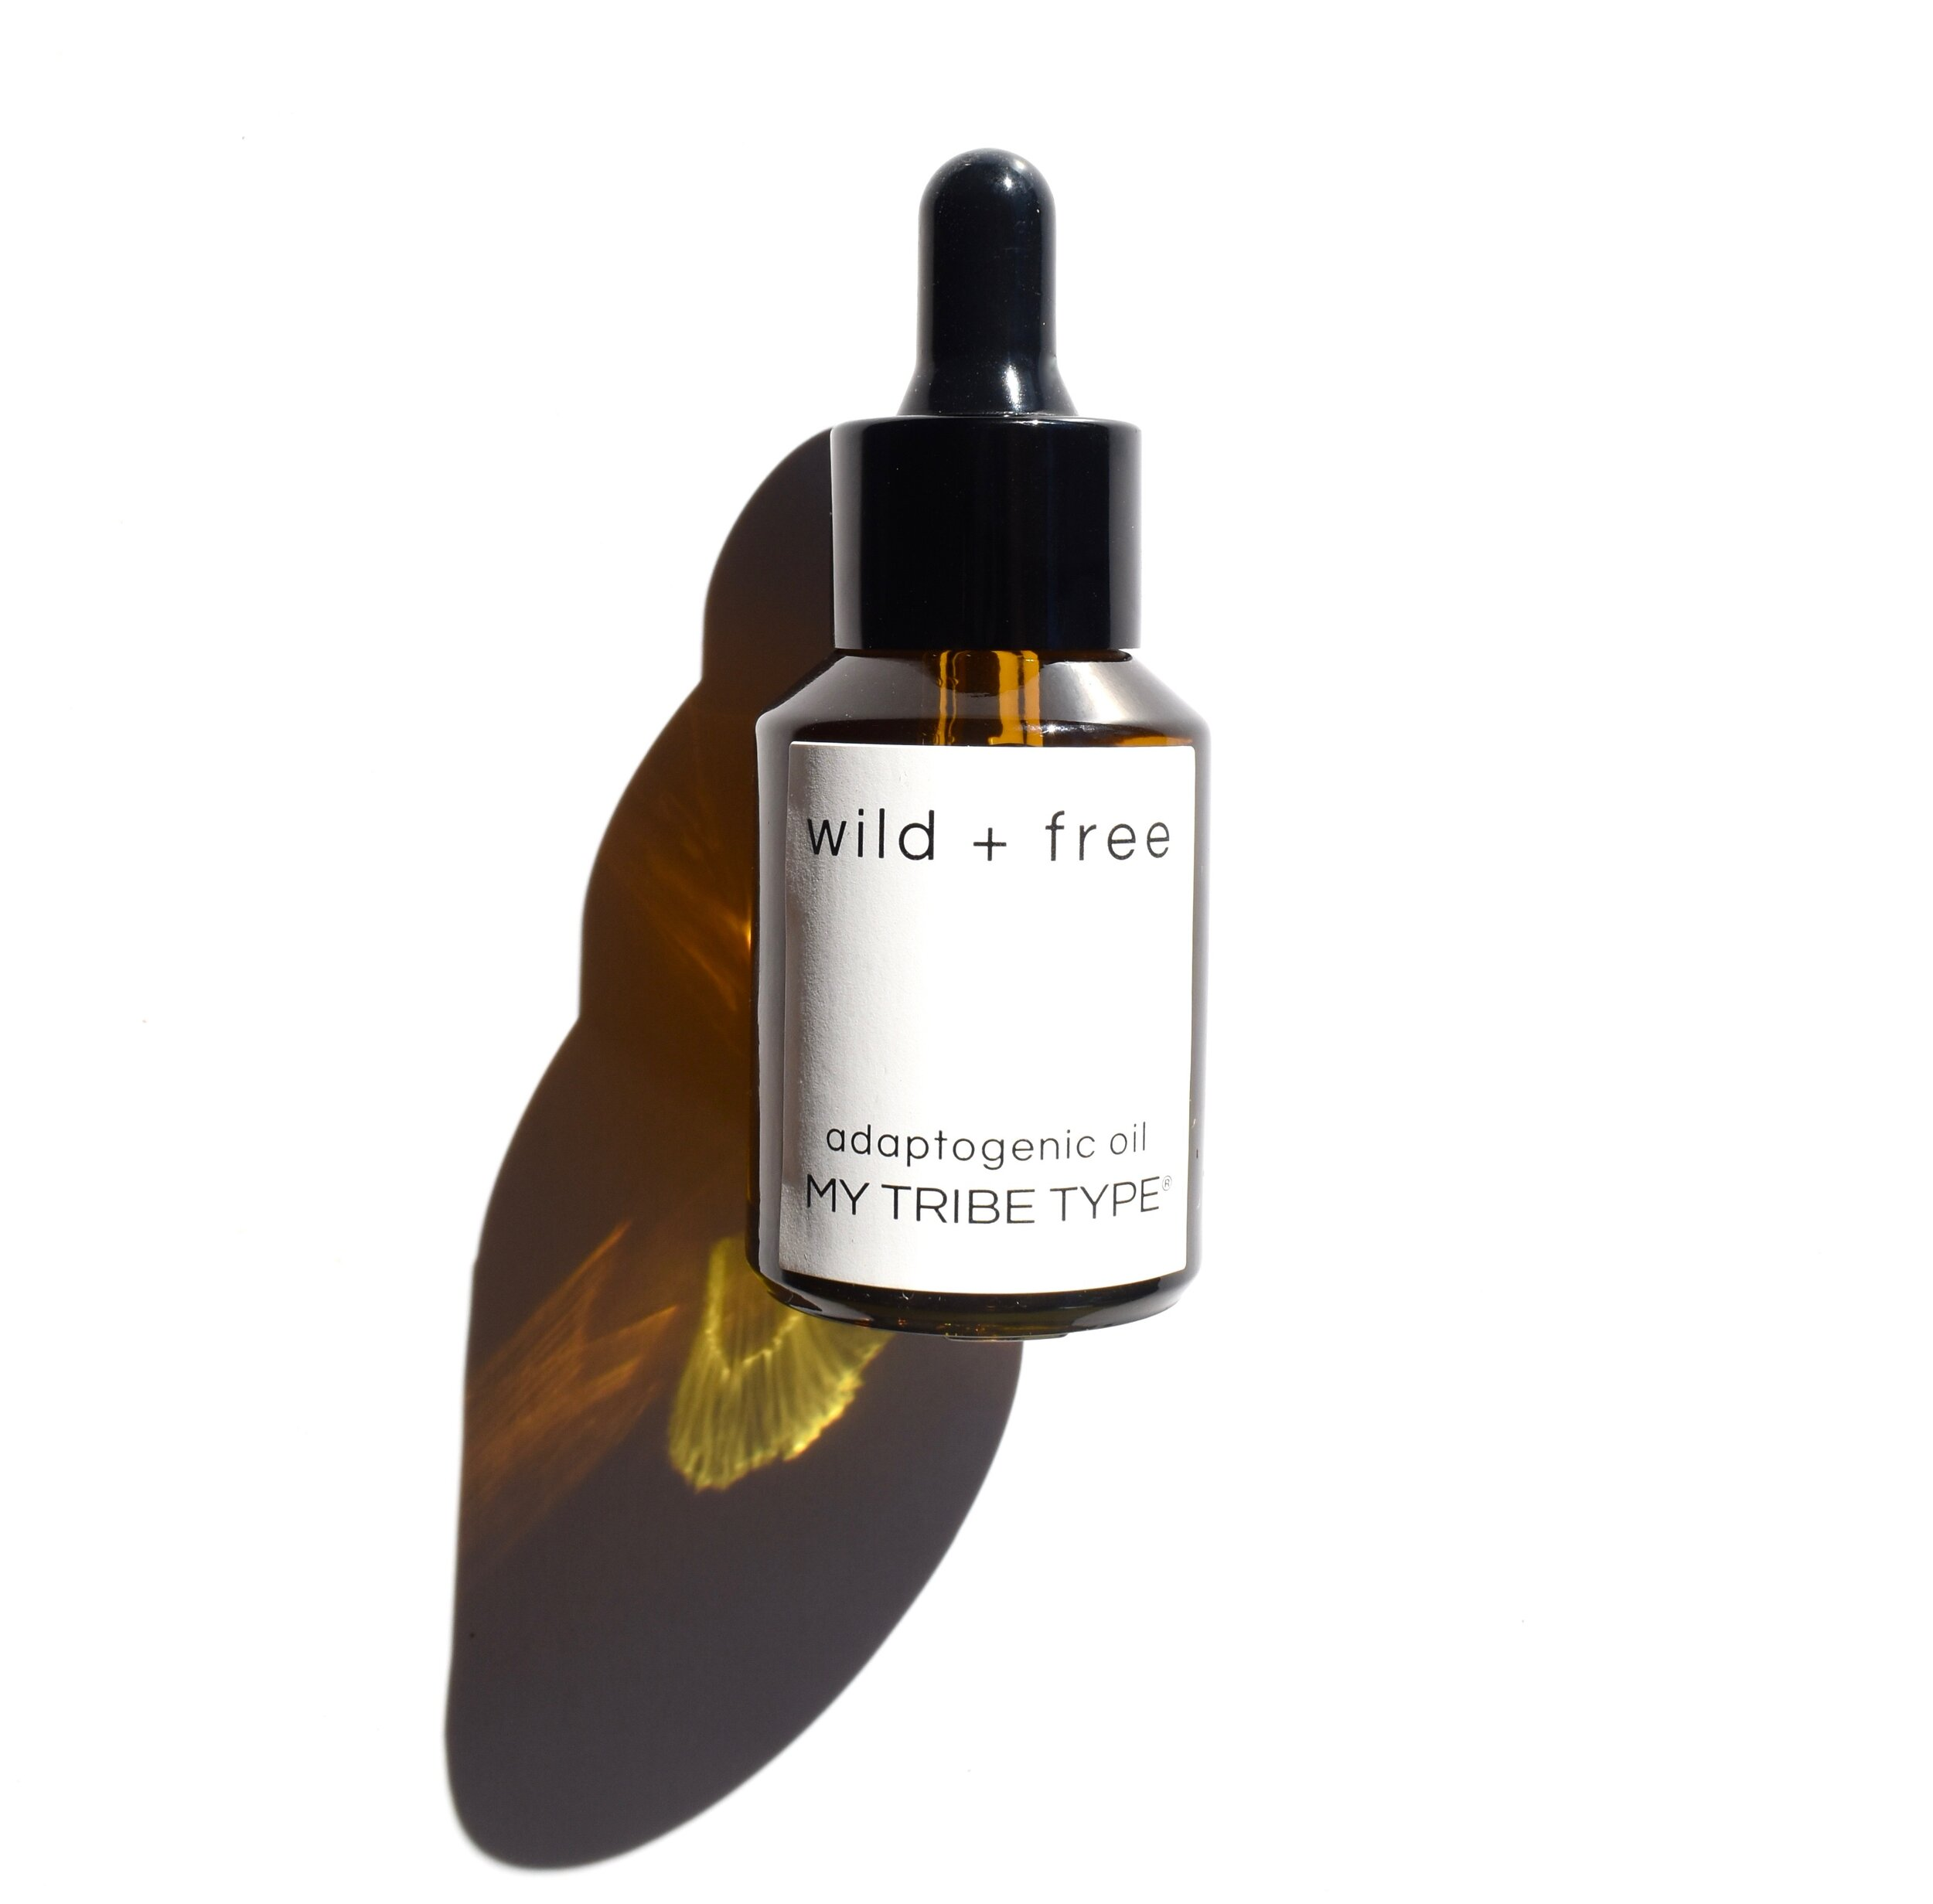 Wild + Free - Adaptogenic Face Oil